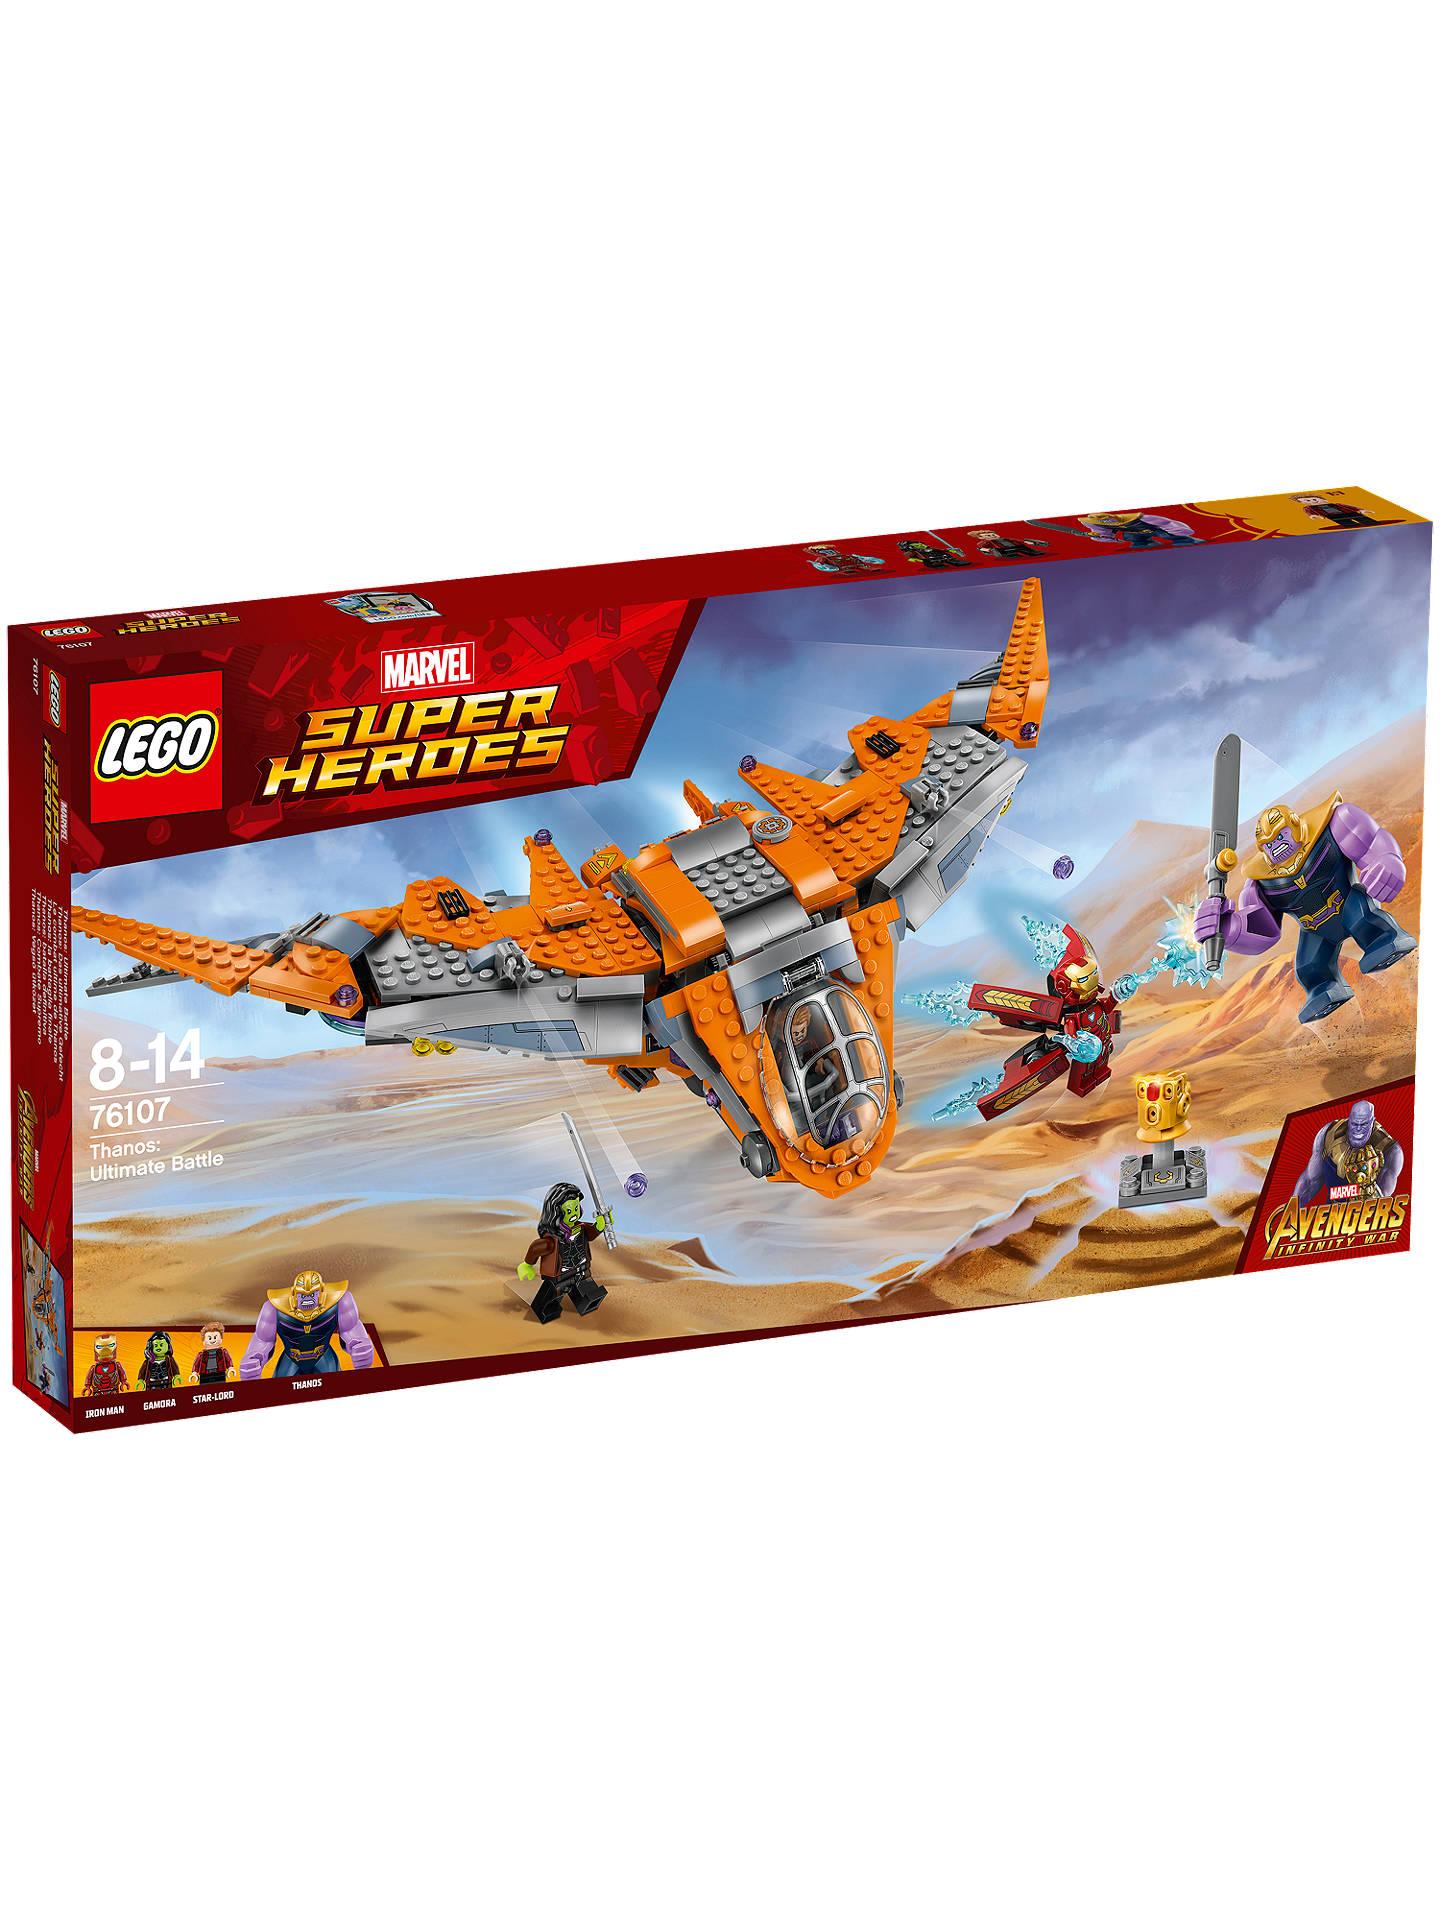 Lego Marvel Super Heroes 76107 Avengers Thanos Ultimate Battle Set